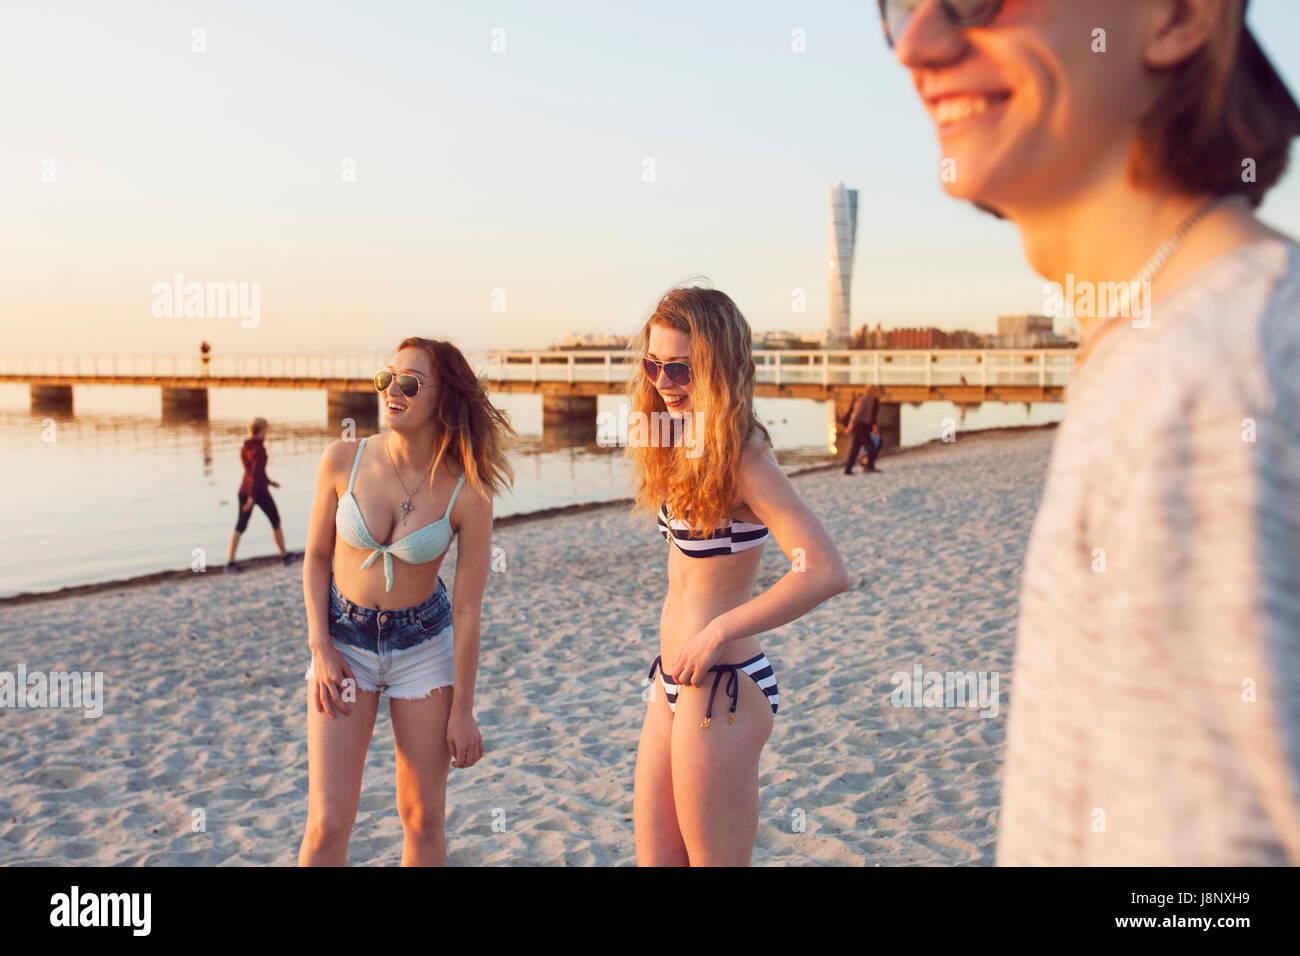 Jeune homme, jeune femme et teenage girl (16-17) smiling on beach Banque D'Images